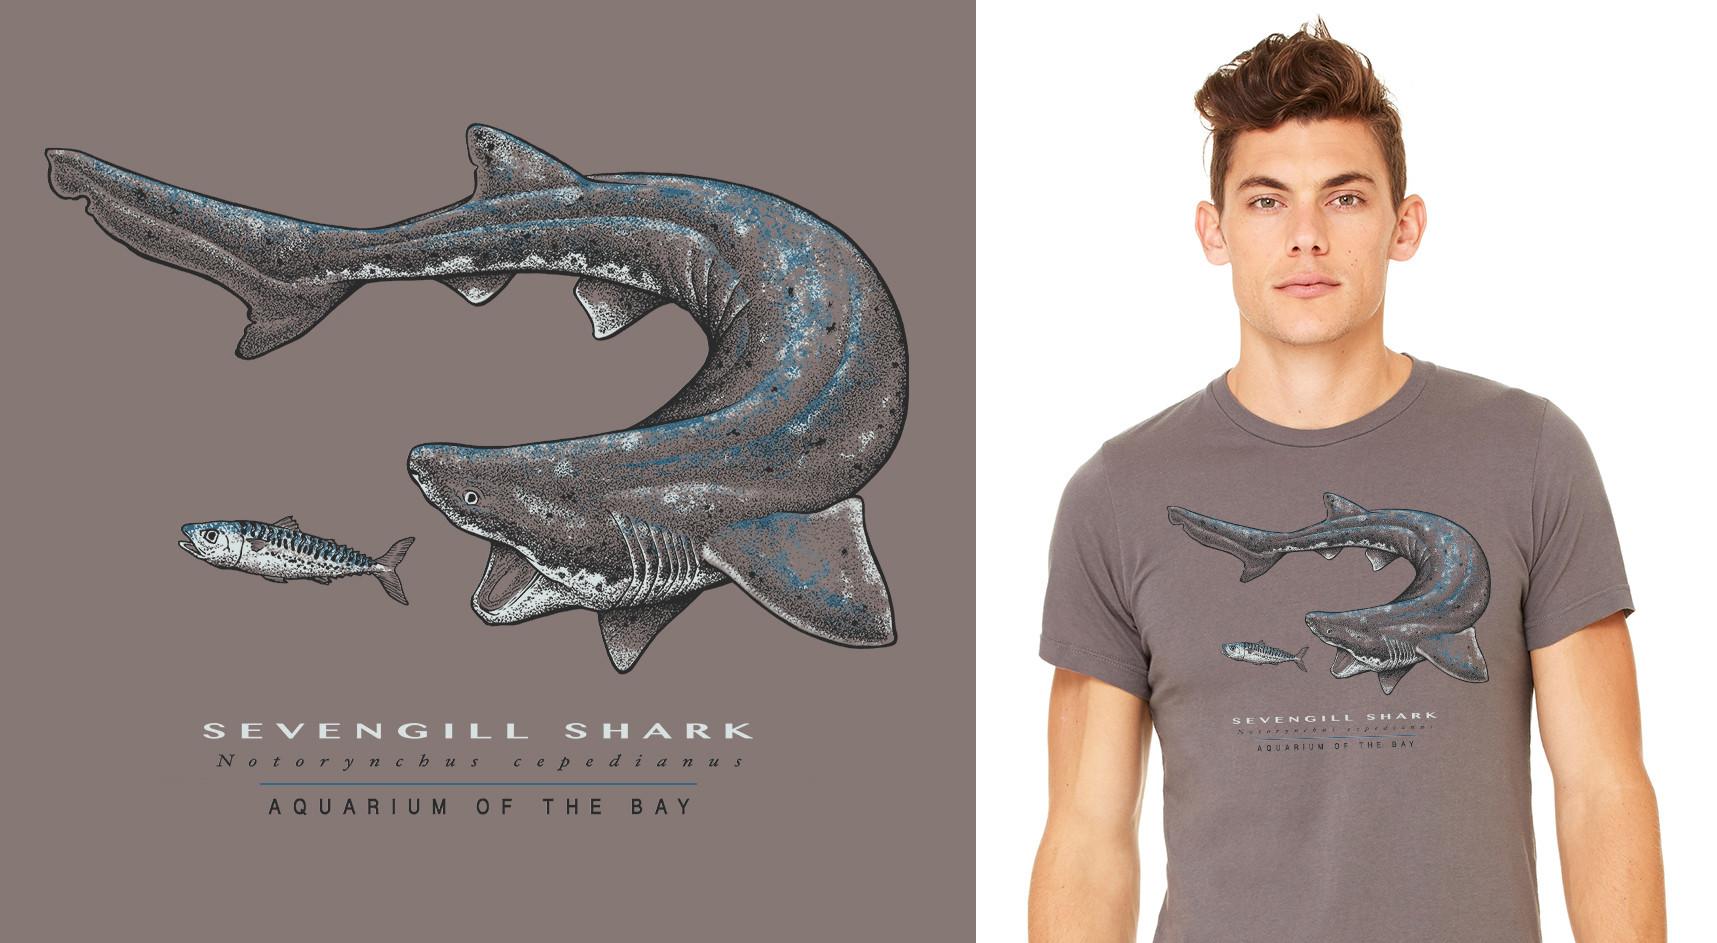 Aquarium of the Bay - Sevengill Shark